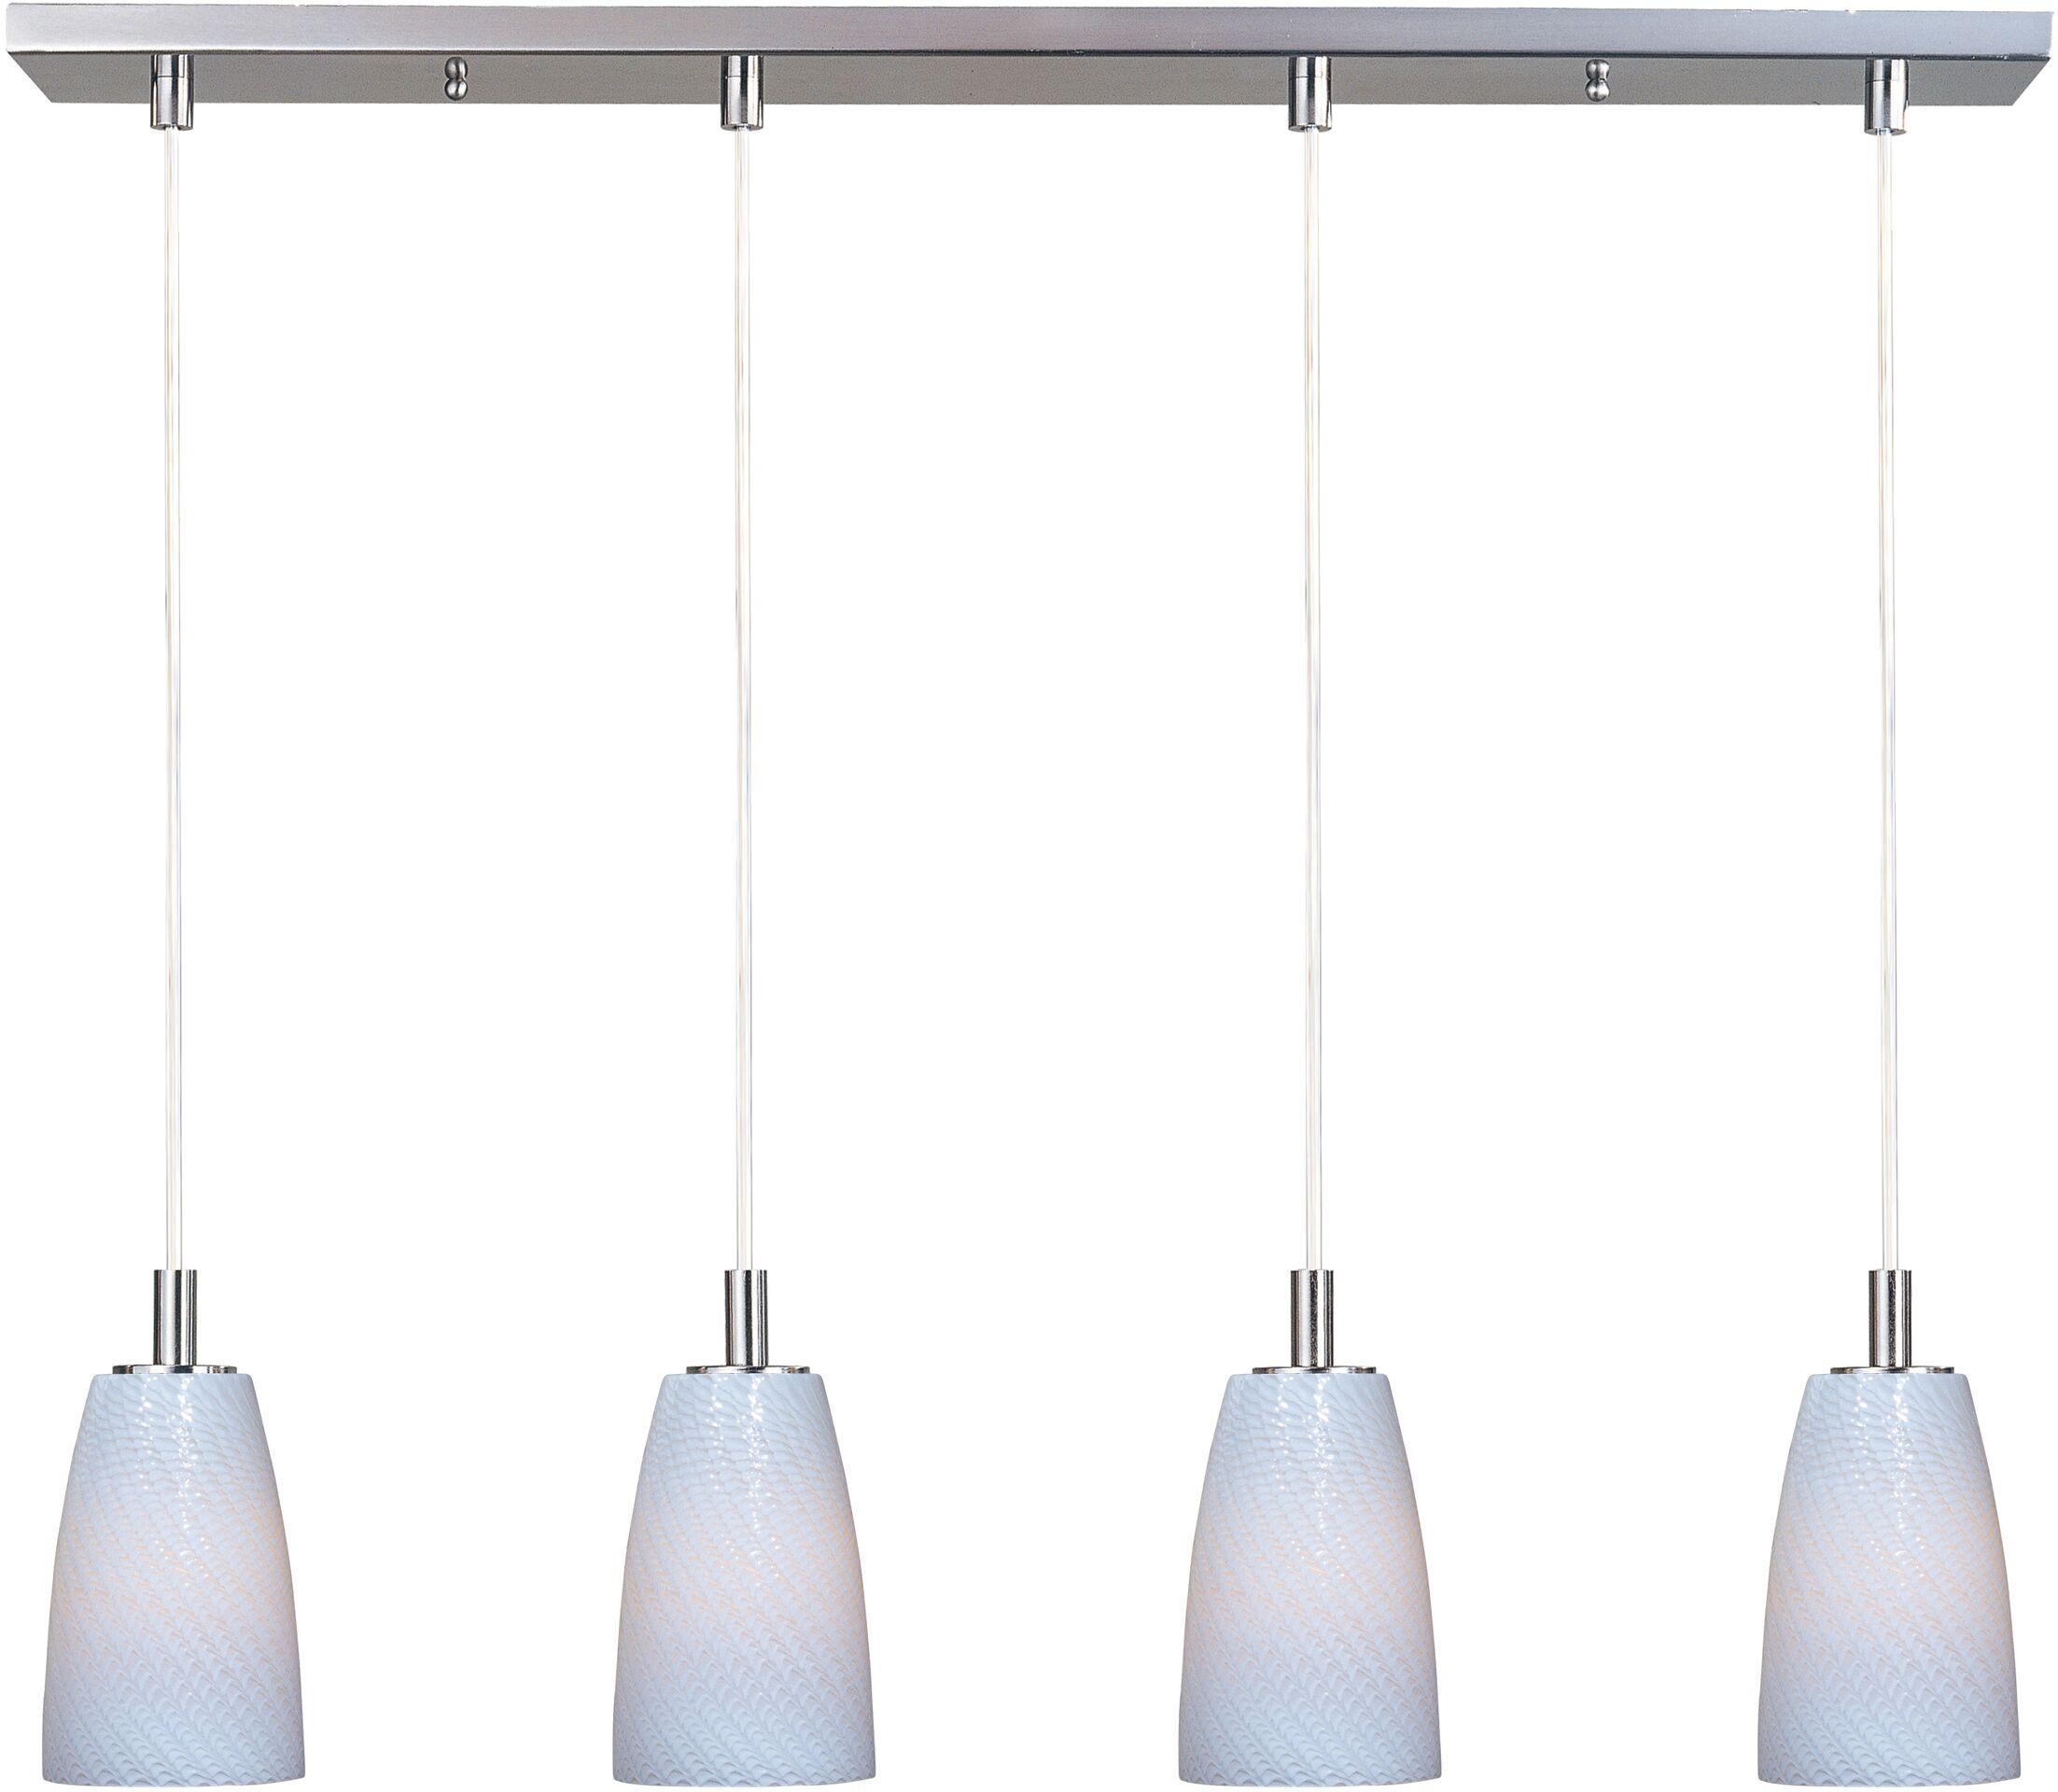 Pegasi 4-Light LED Kitchen Island Pendant Shade Color: White, Finish: Satin Nickel